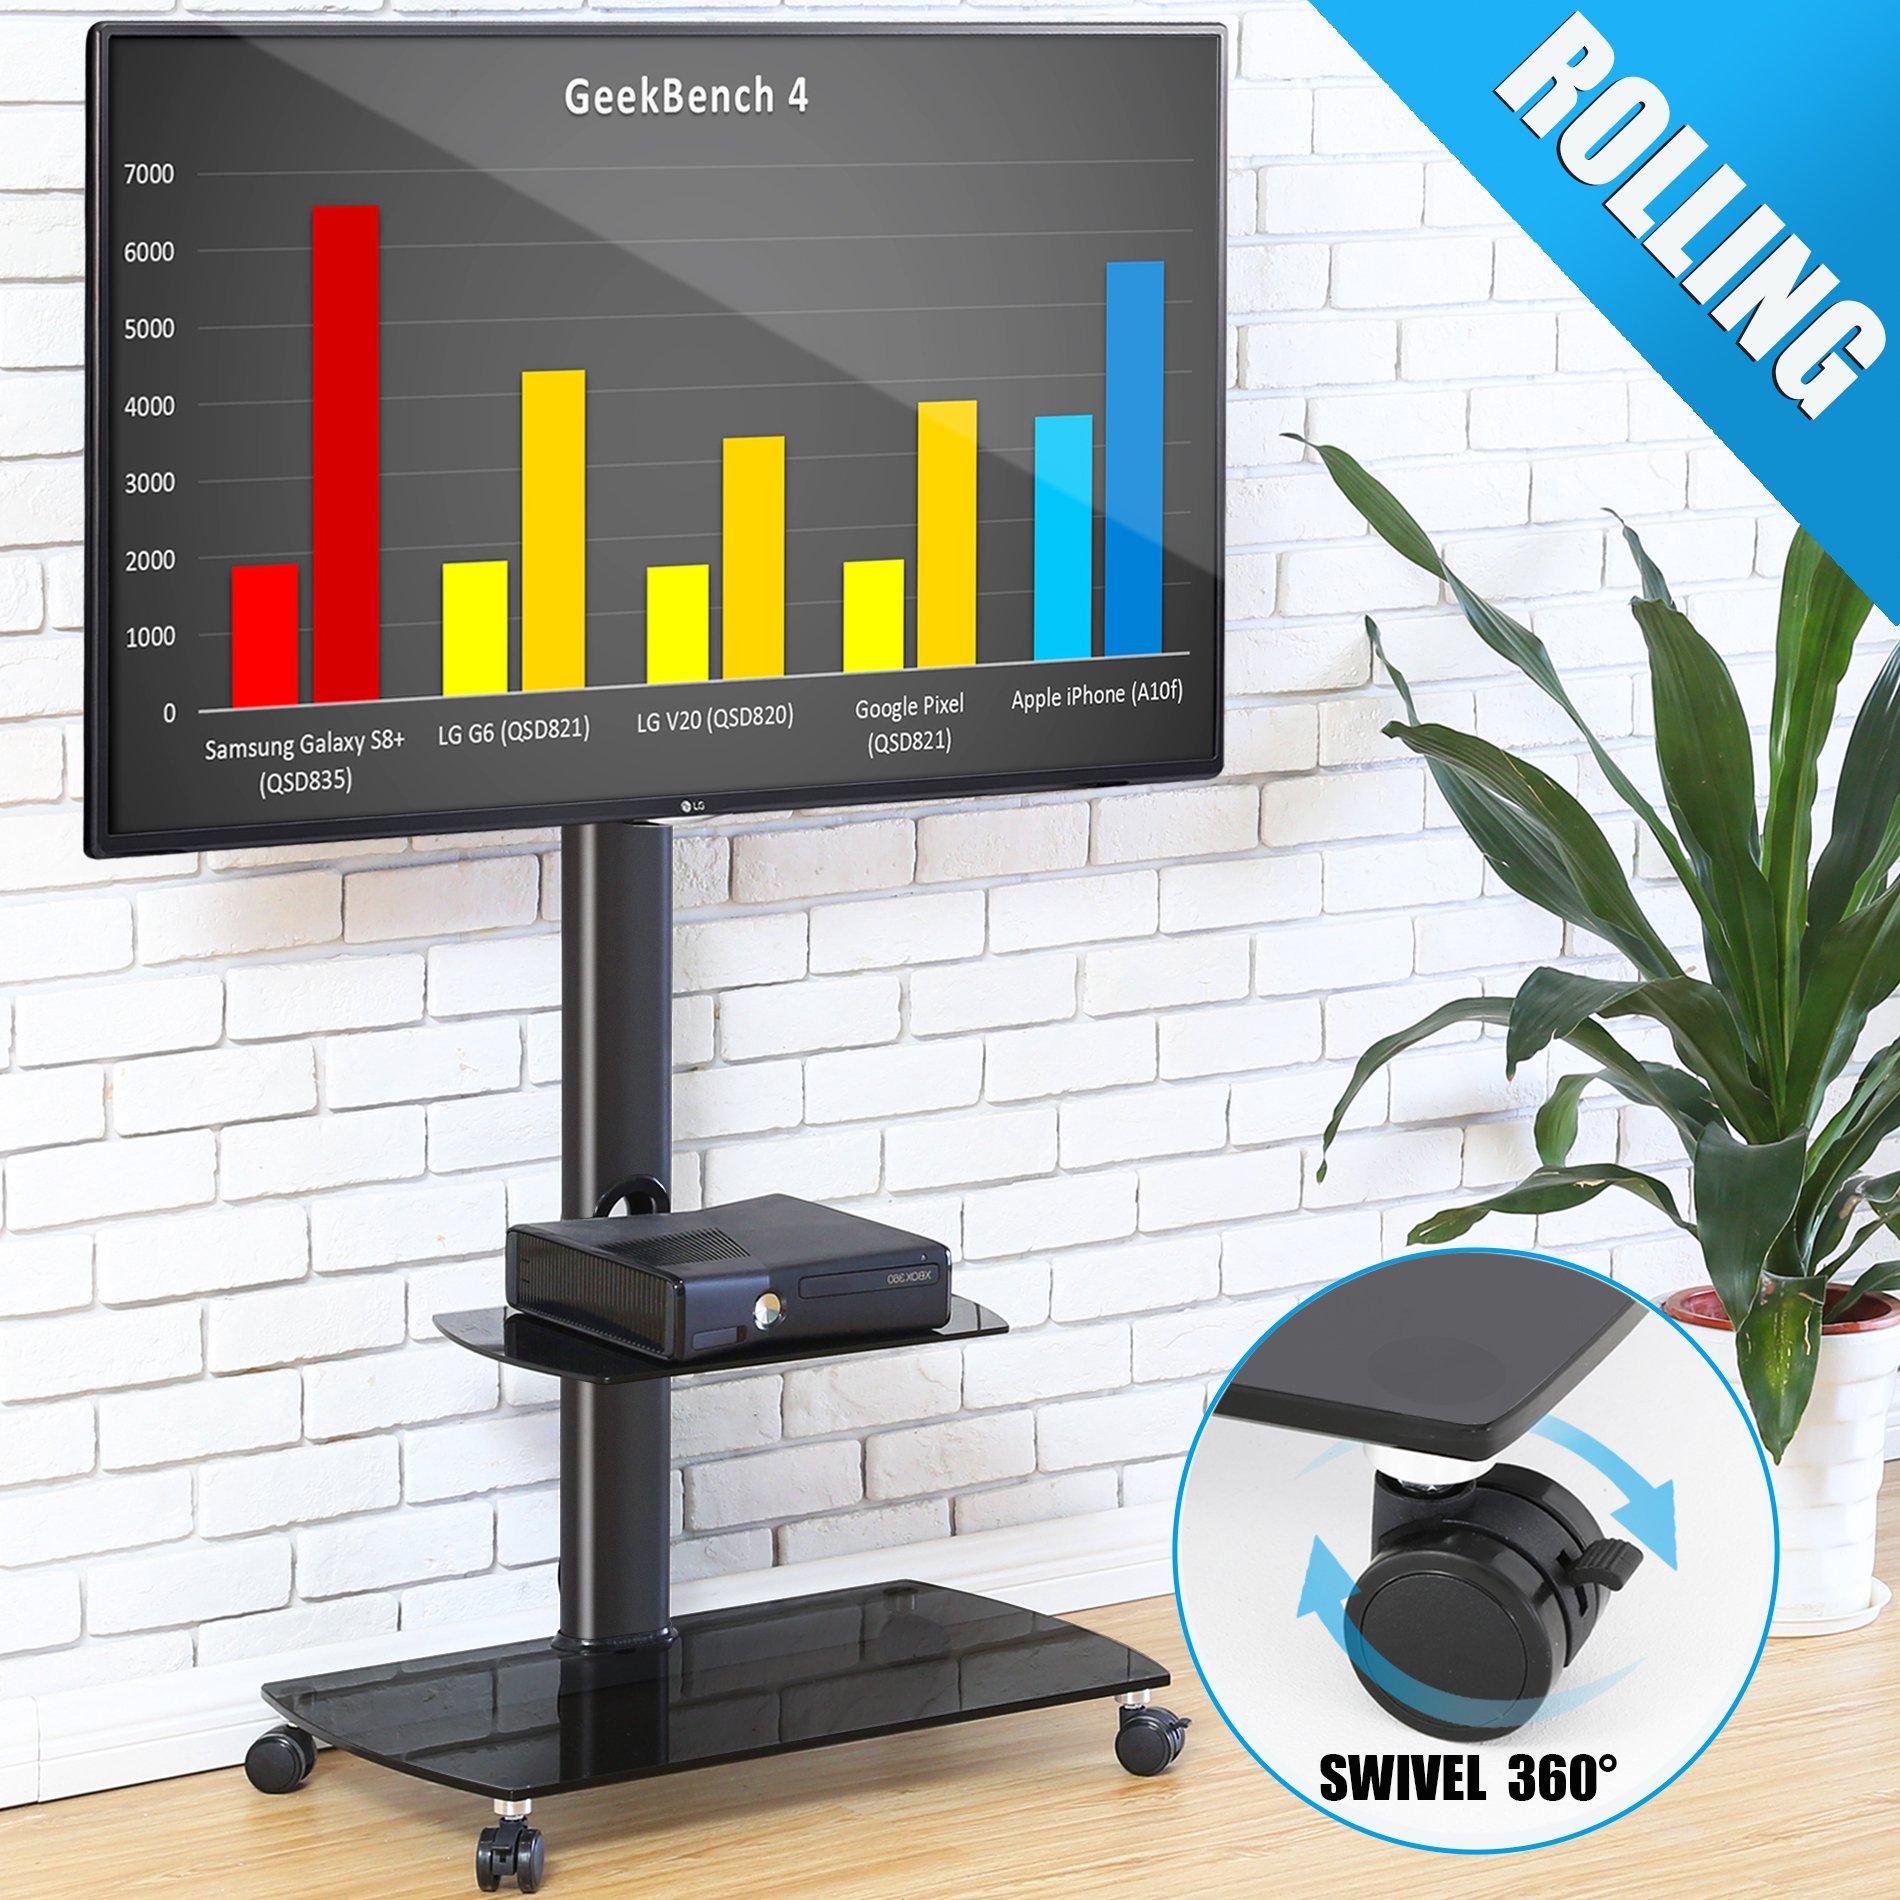 45bce47e869 FITUEYES Soporte Móvil de Suelo con 2 Estantes para TV LCD LED OLED Plasma  Plano Curvo